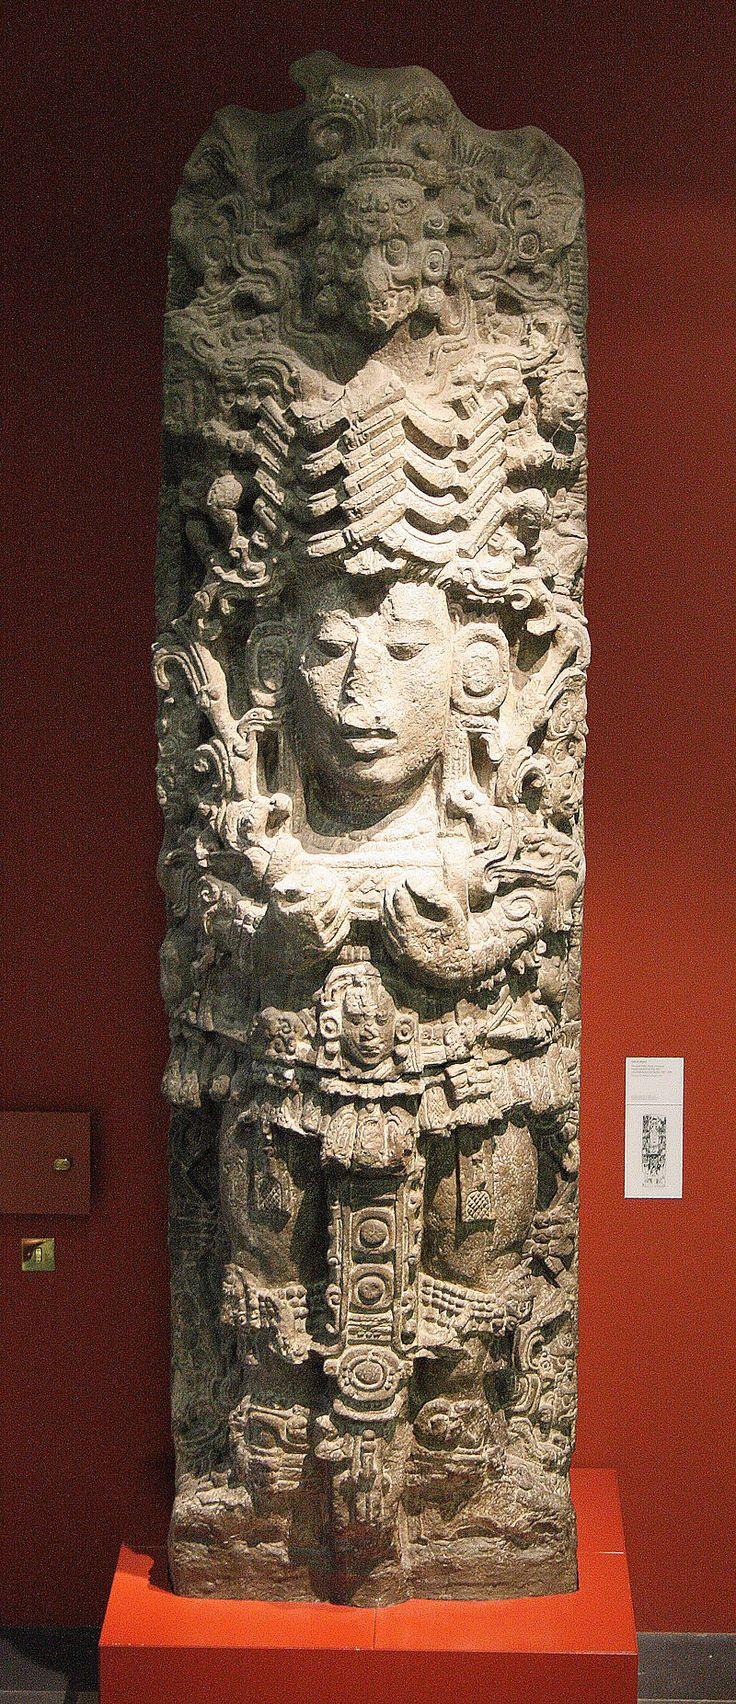 Stela A Copan 02 - Ancient Maya art - Wikipedia, the free encyclopedia